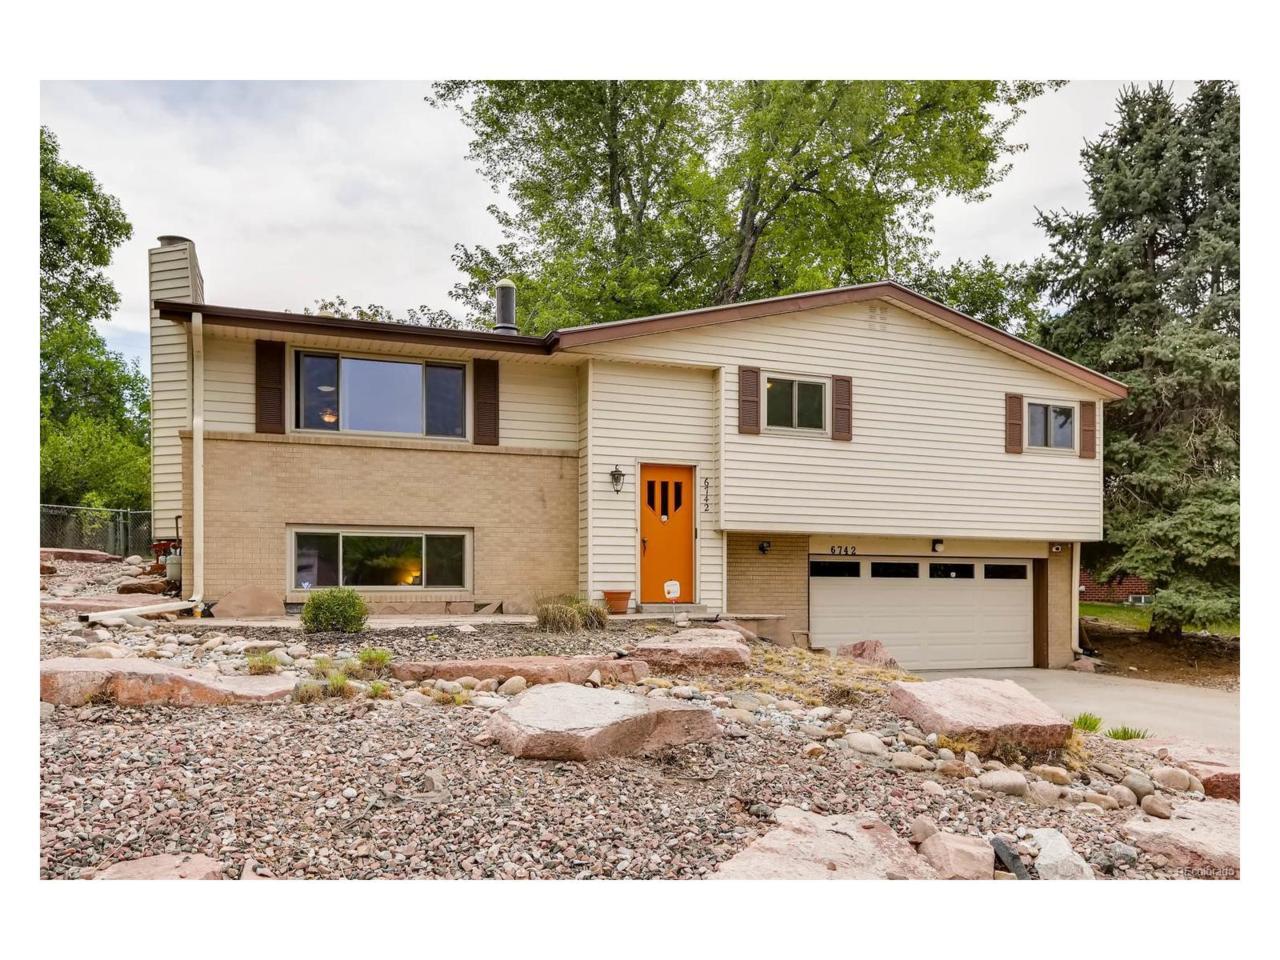 6742 Flower Street, Arvada, CO 80004 (MLS #6248403) :: 8z Real Estate